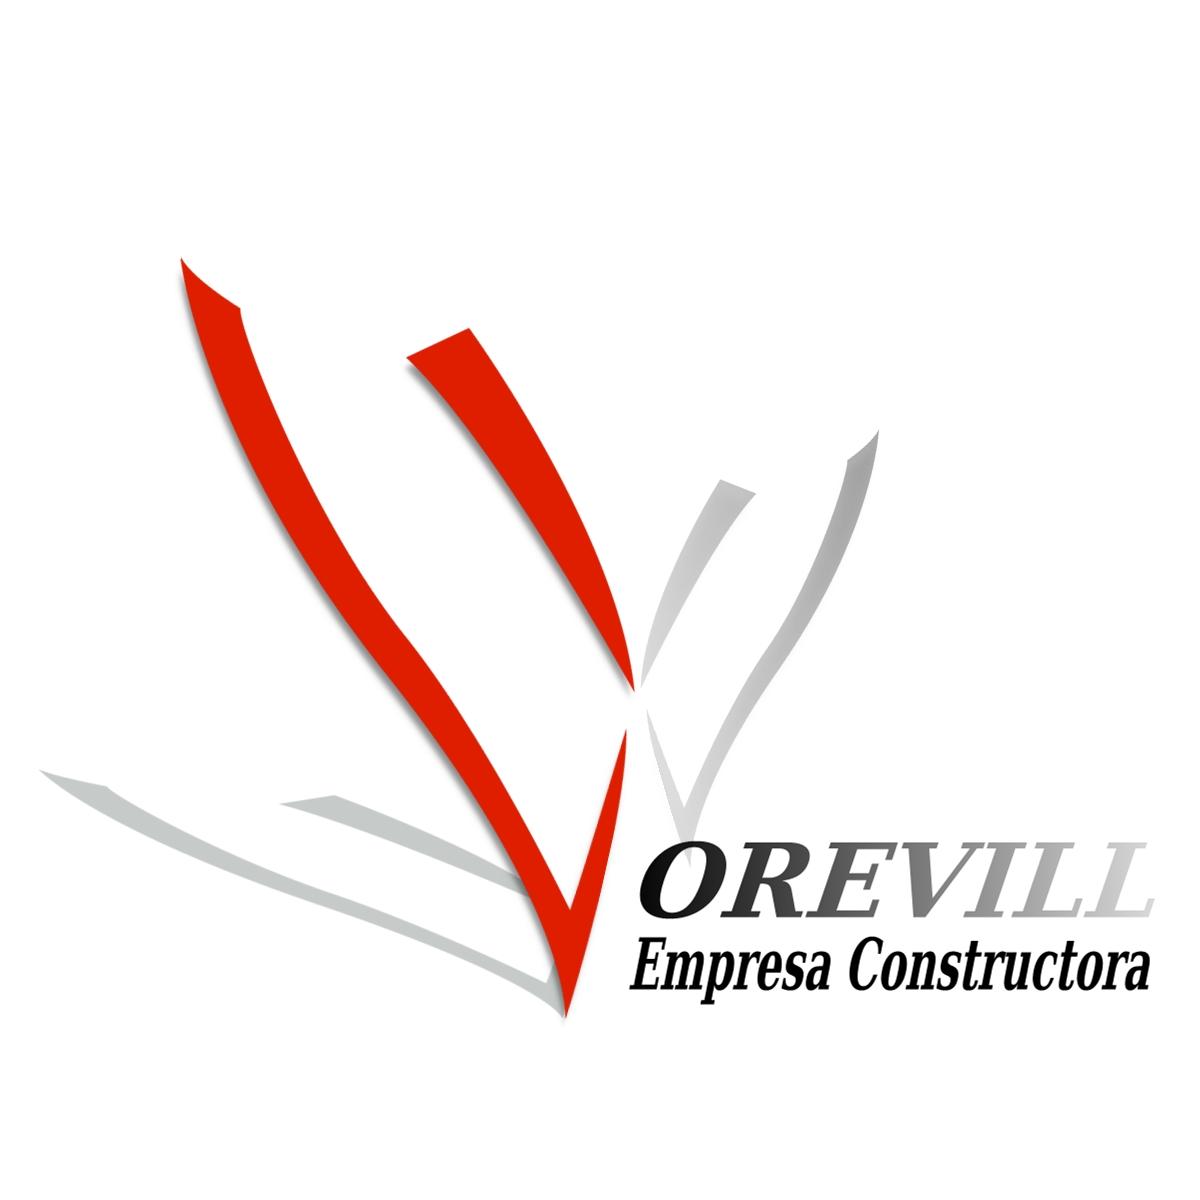 Orevill empresa constructora pisos industriales pisos for Empresa logos